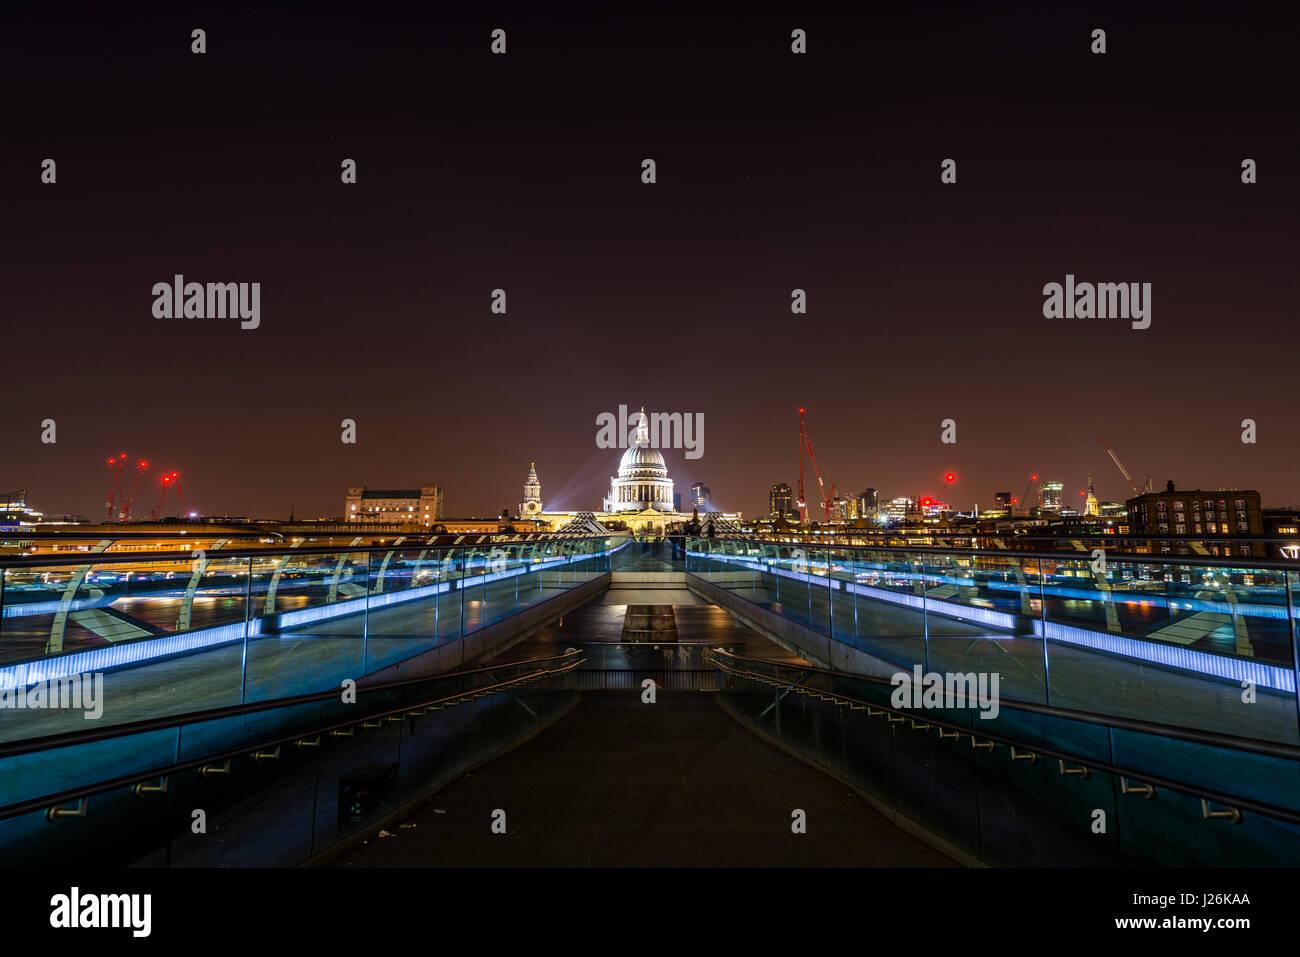 Illuminated Millennium Bridge and St. Paul's Cathedral, night shot, London, London, England, United Kingdom Stock Photo